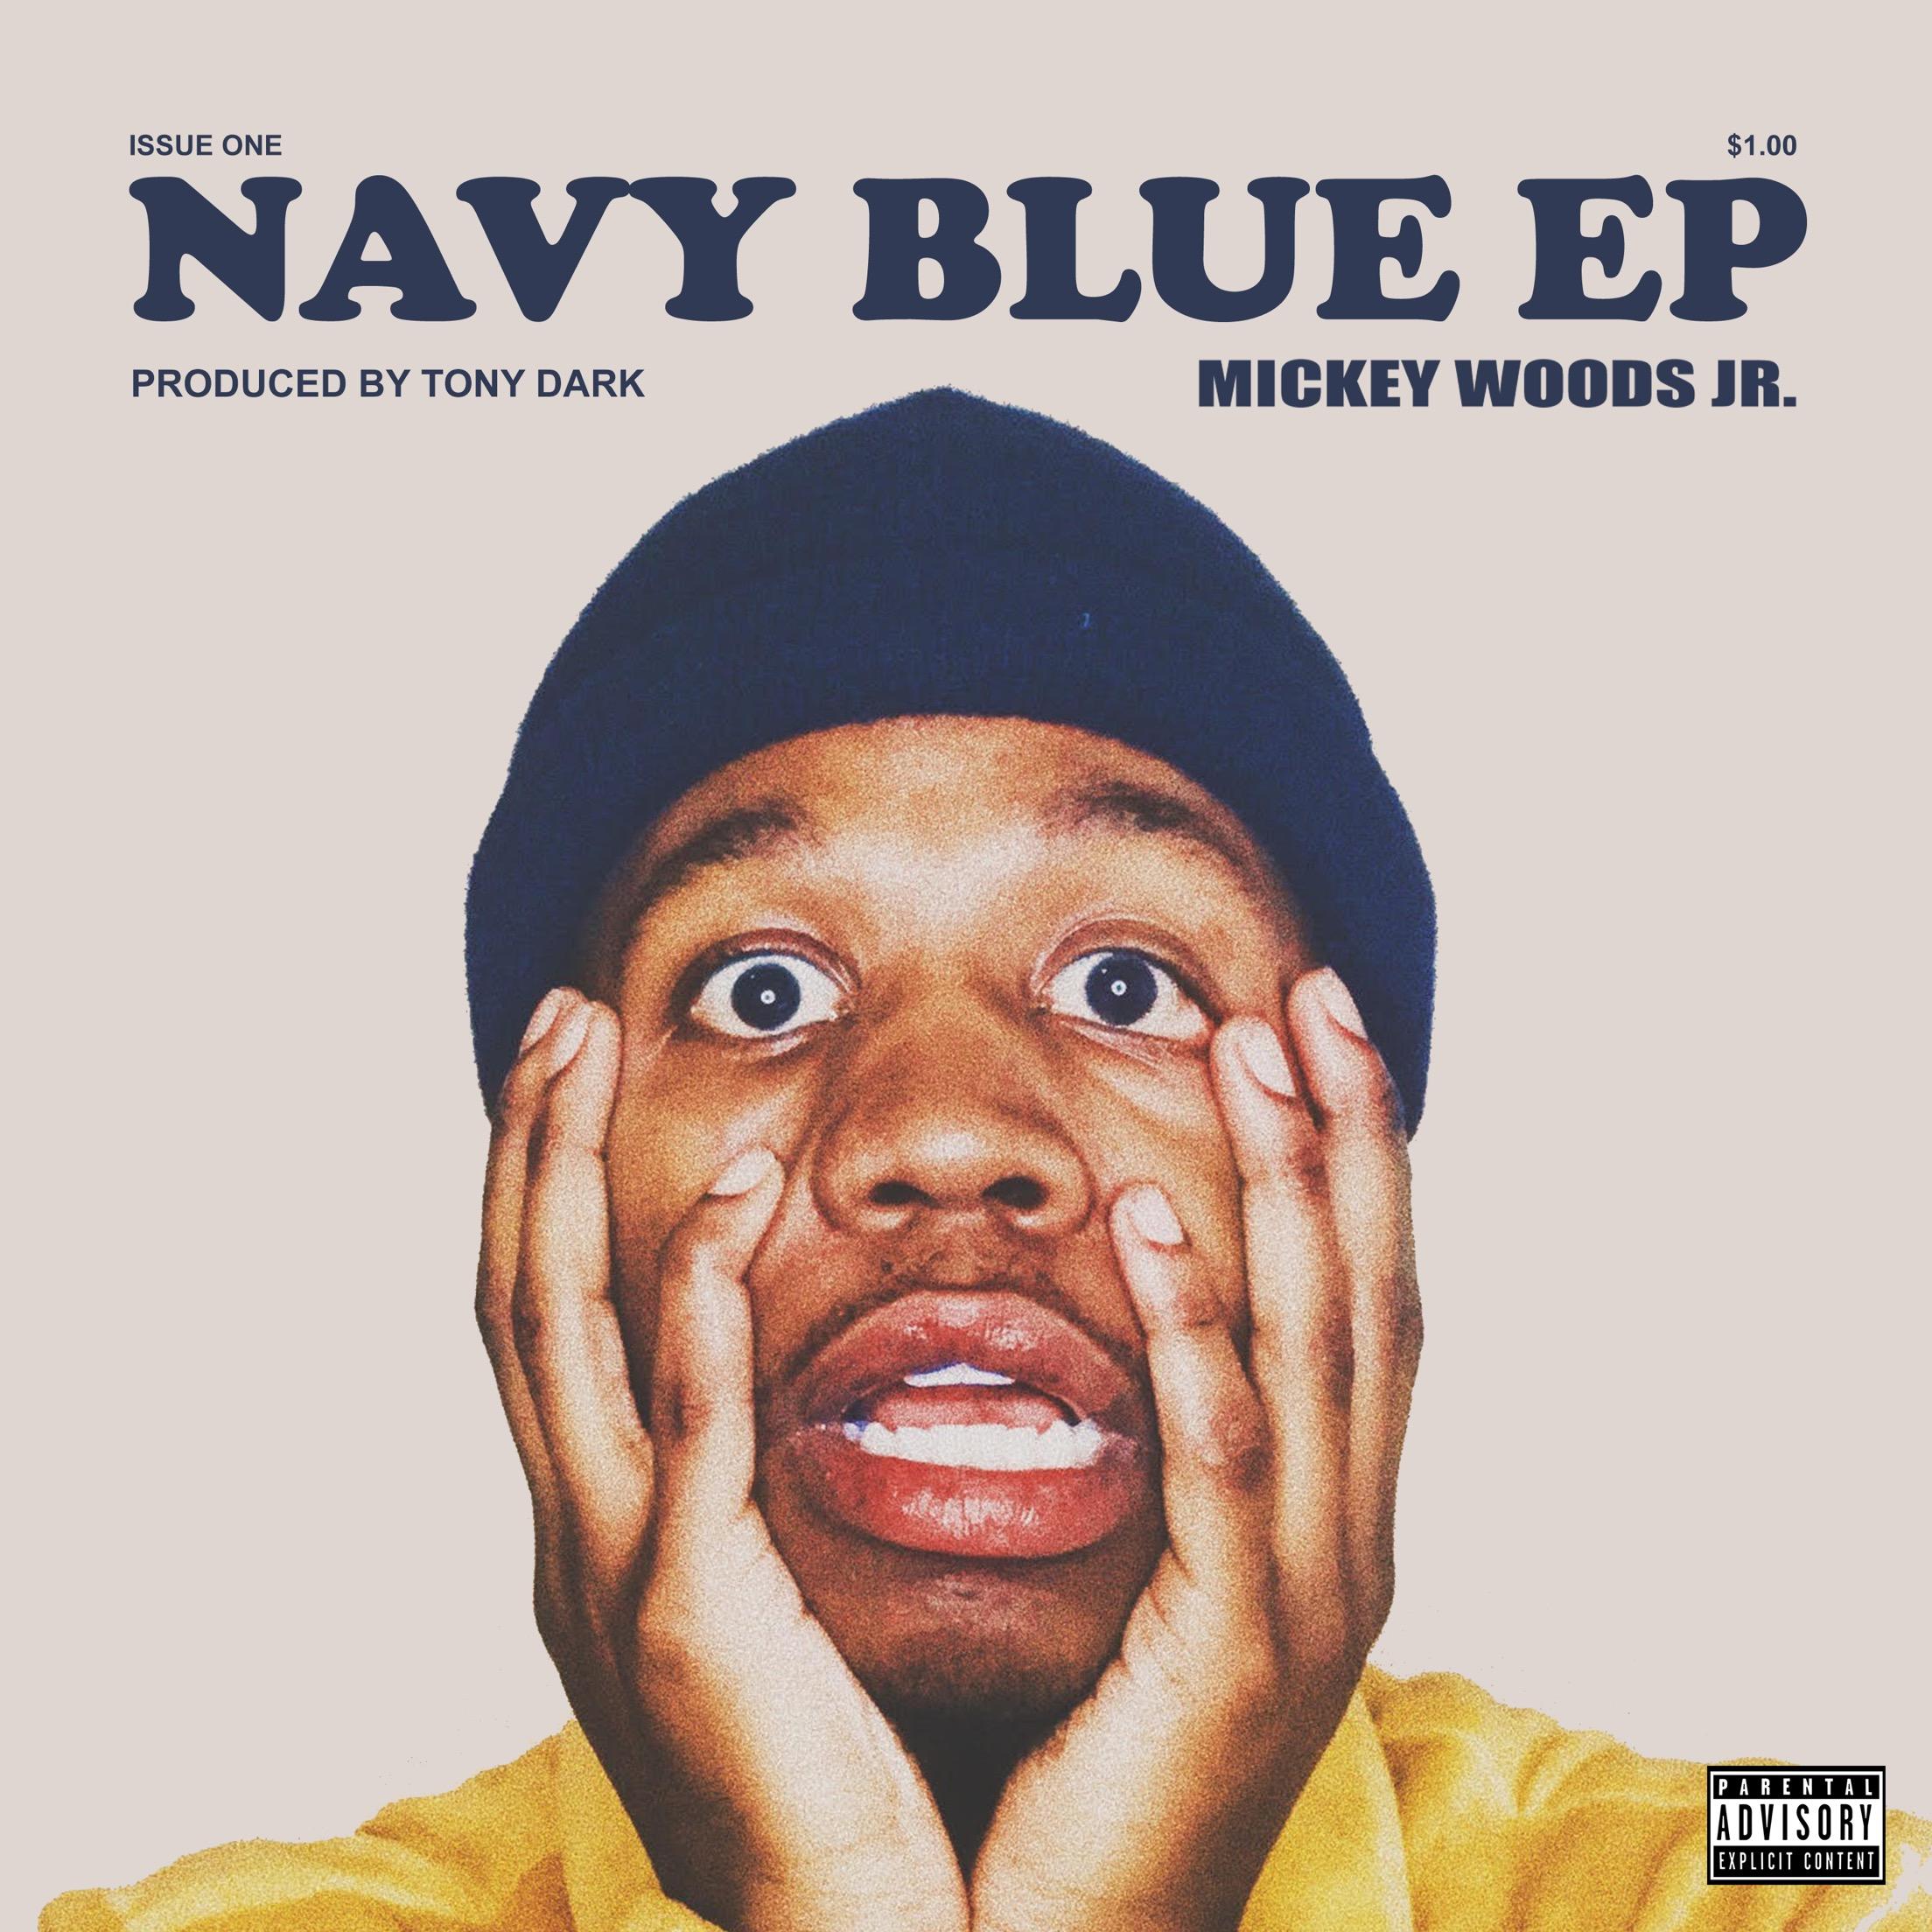 Mickey Woods Jr. & Tony Dark - Navy Blue EP    03. Navy Blue Saxophone Seb Zillner  06. Untitled Duduk Seb Zillner   © 2018 Mickey Woods Jr.  Listen on Spotify